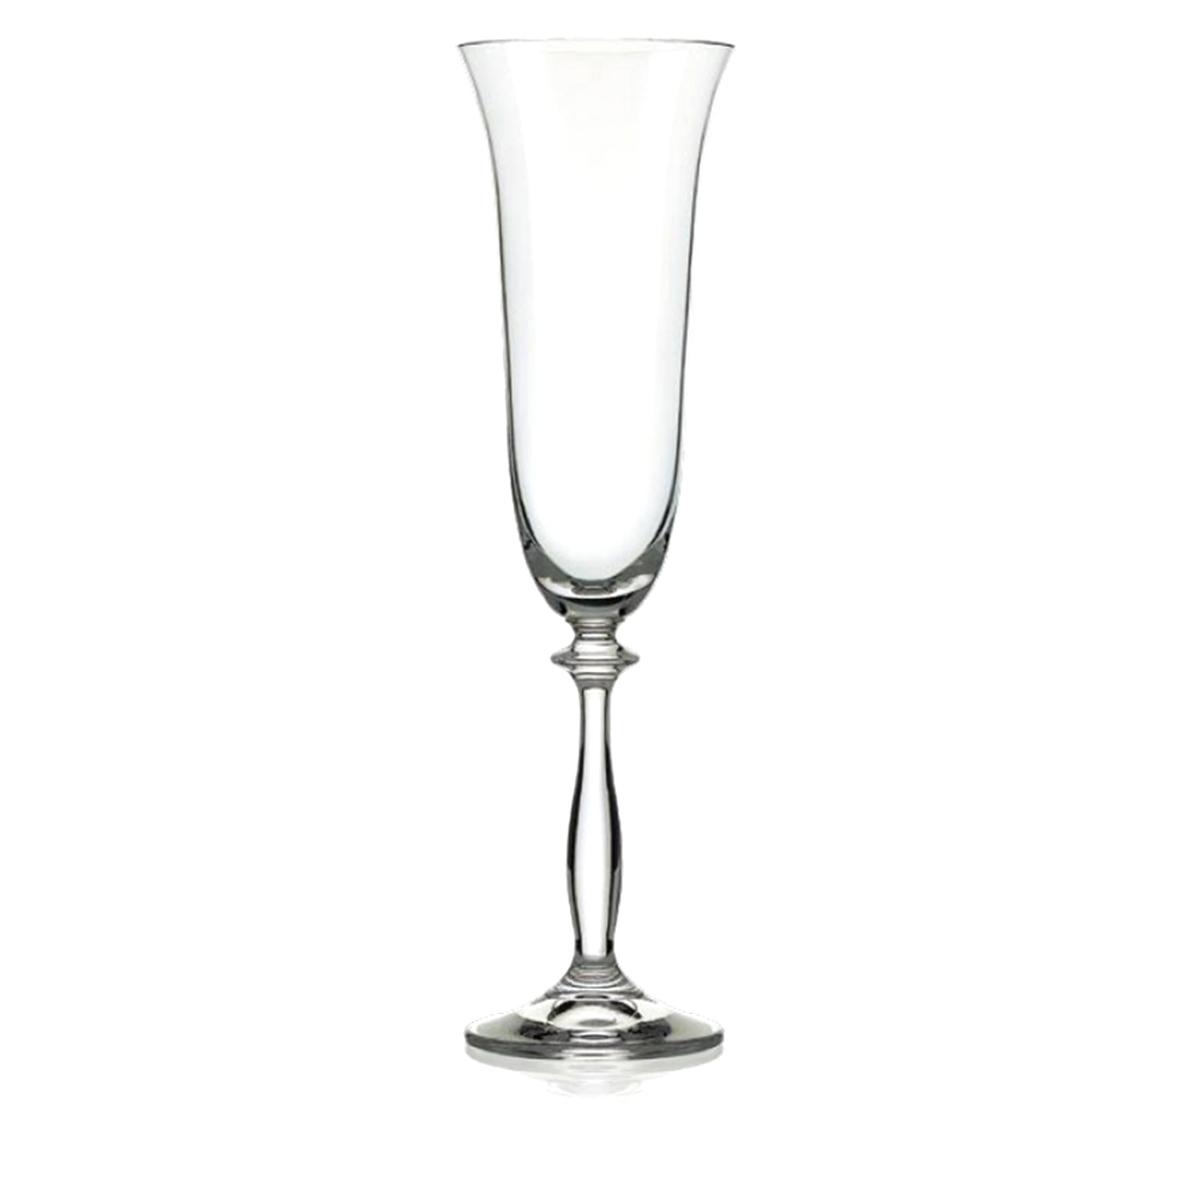 Набор бокалов для шампанского Bohemia Crystal Анжела, 190 мл, 6 шт. 40600/Opt/190 bohemia crystal набор бокалов для шампанского felina 25 см 2 шт